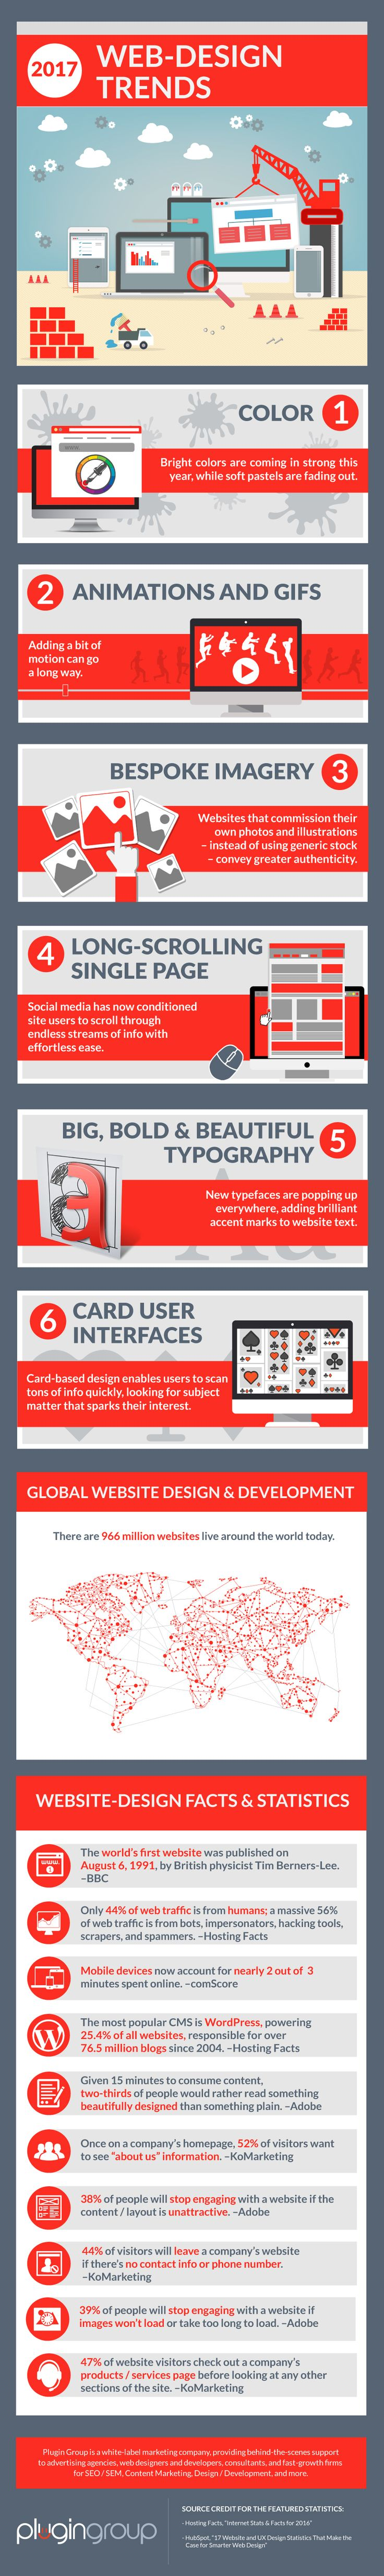 2017 Web-Design Trends #Infographic #WebDesign